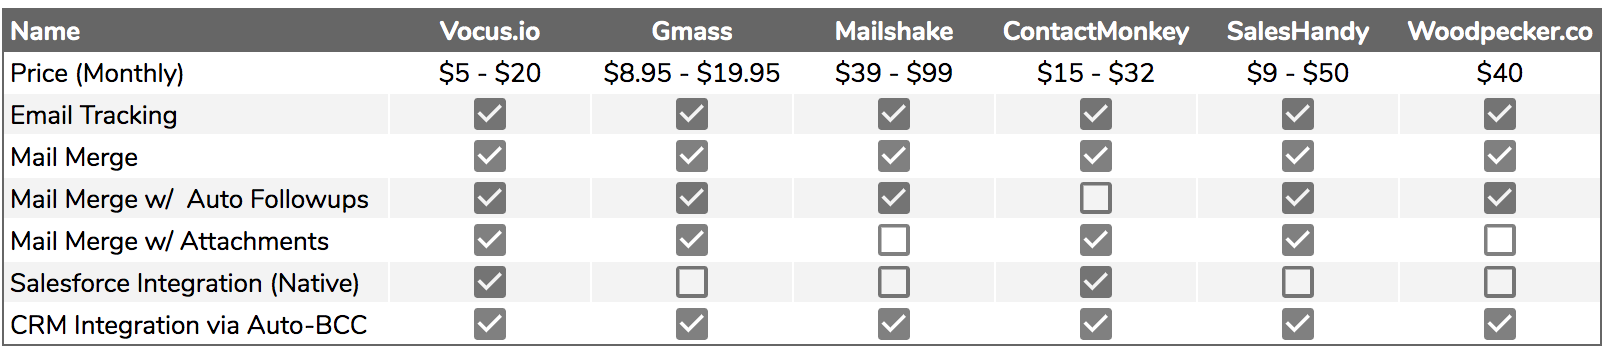 Mailmerge Comparisons